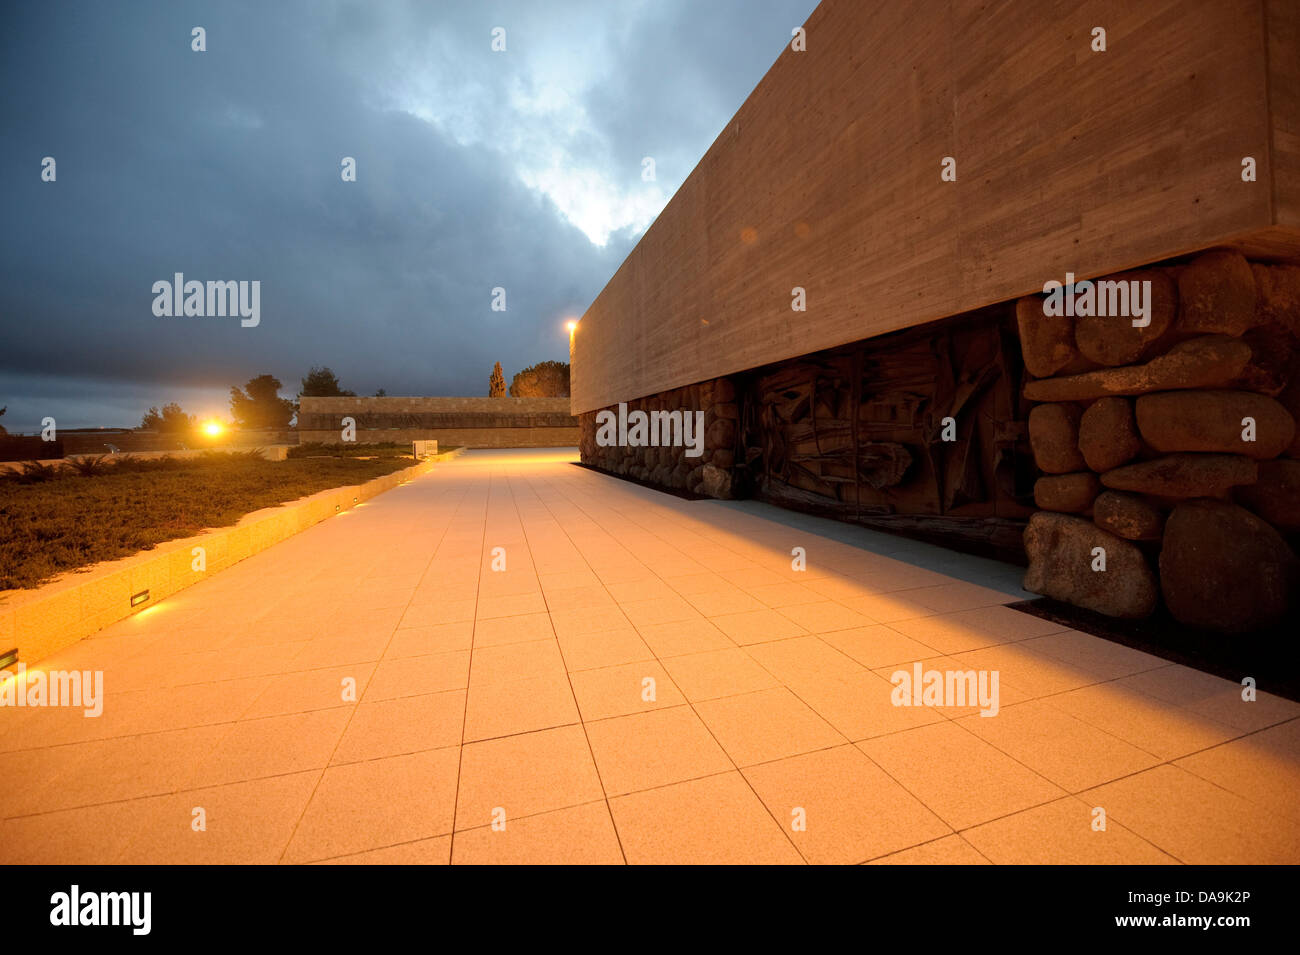 Memorial, Jew, Jewish, pogrom, persecution, Yad Vashem, Holocaust, Israel, Jerusalem, Middle East, Near East, - Stock Image